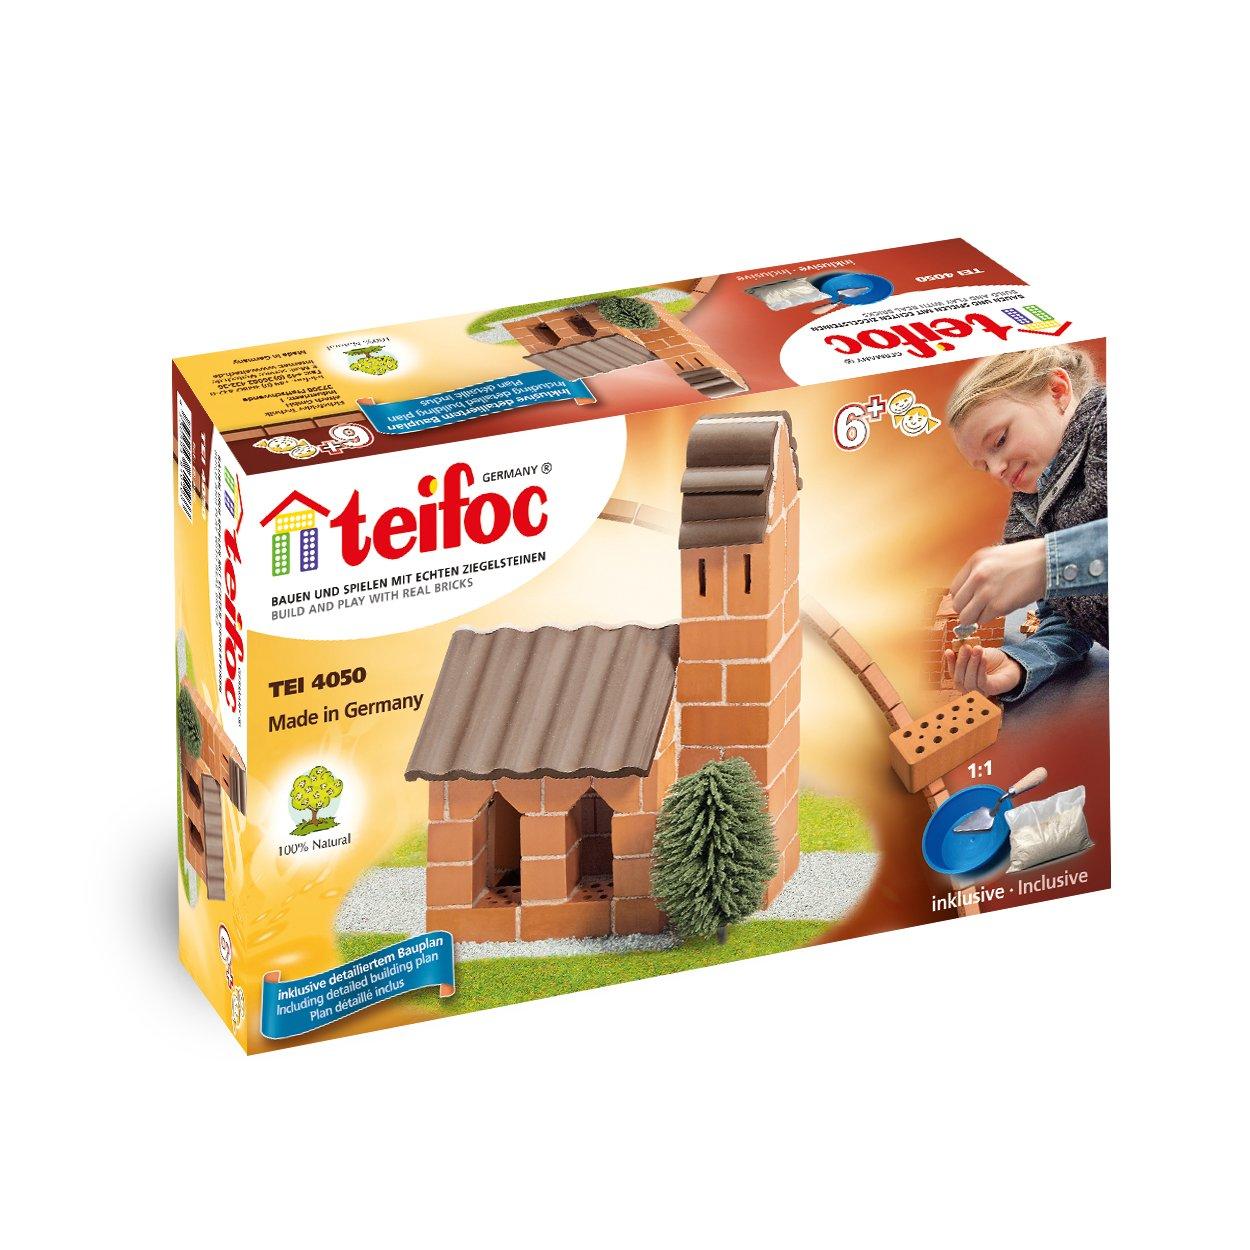 Teifoc TEI 902 Mortar 1 Kg: Amazon.co.uk: Toys & Games